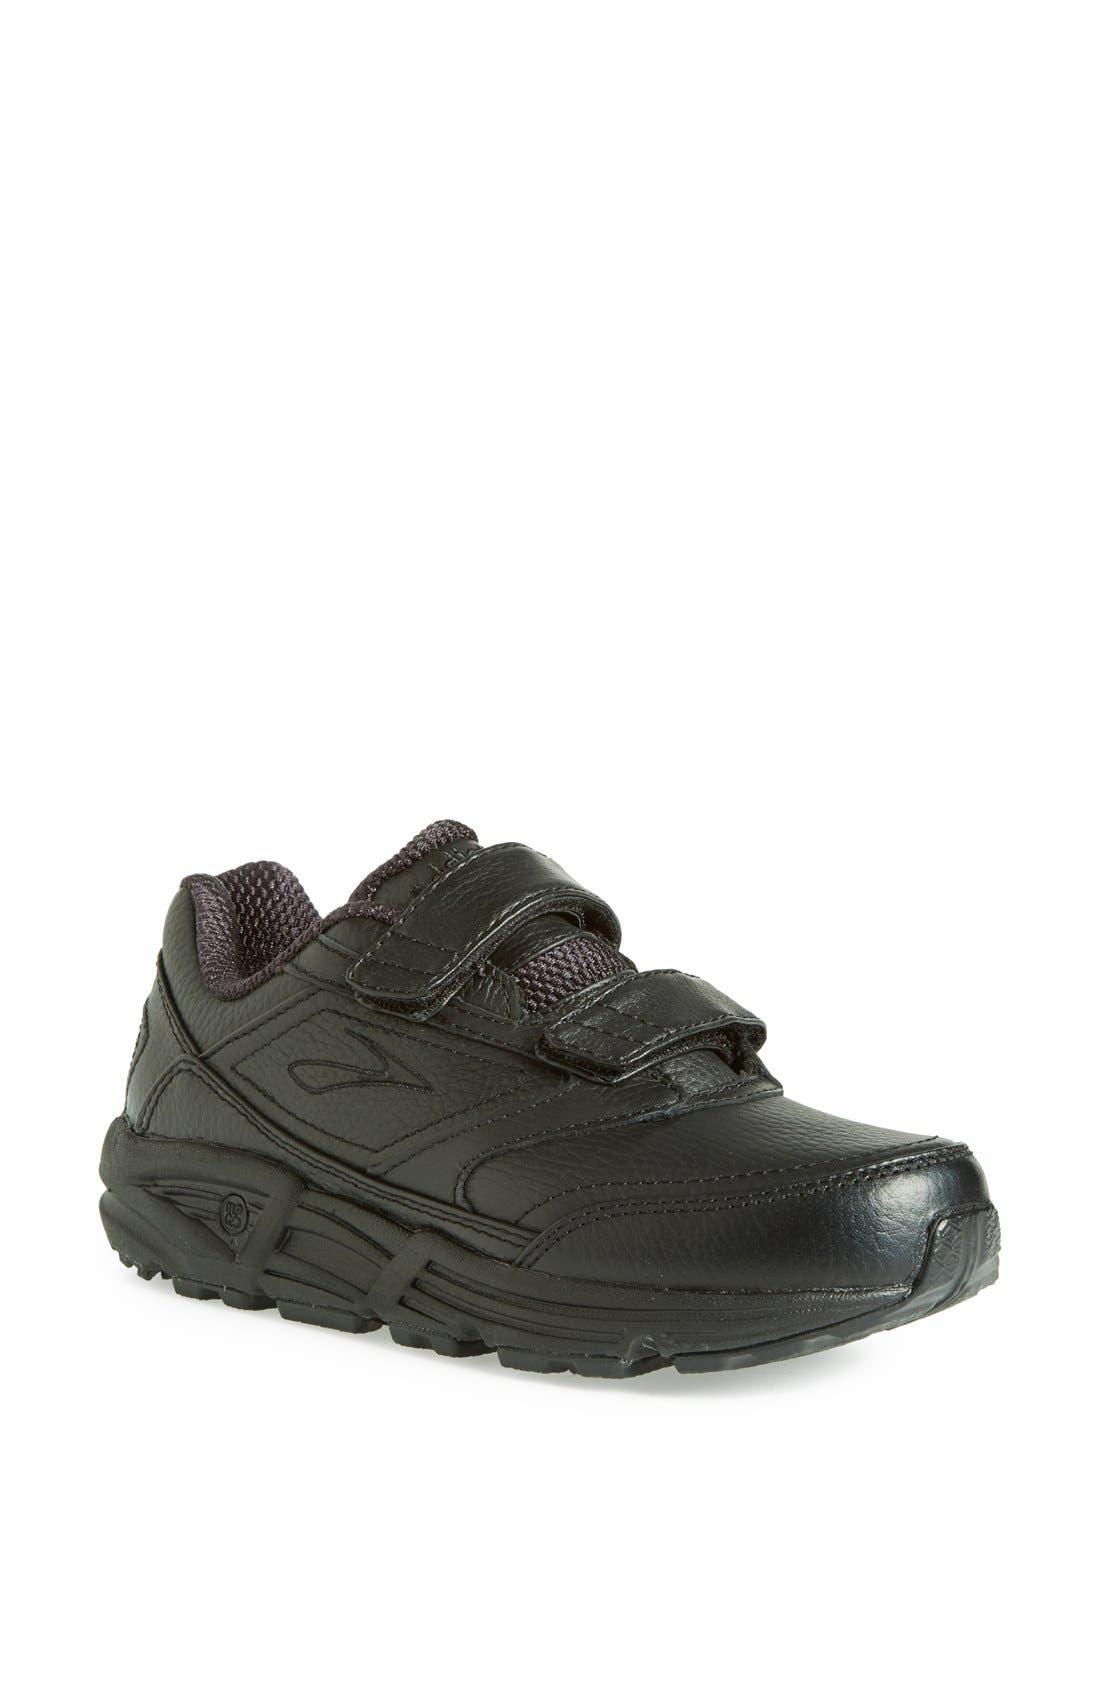 Alternate Image 1 Selected - Brooks 'Addiction' Walking Shoe (Women)